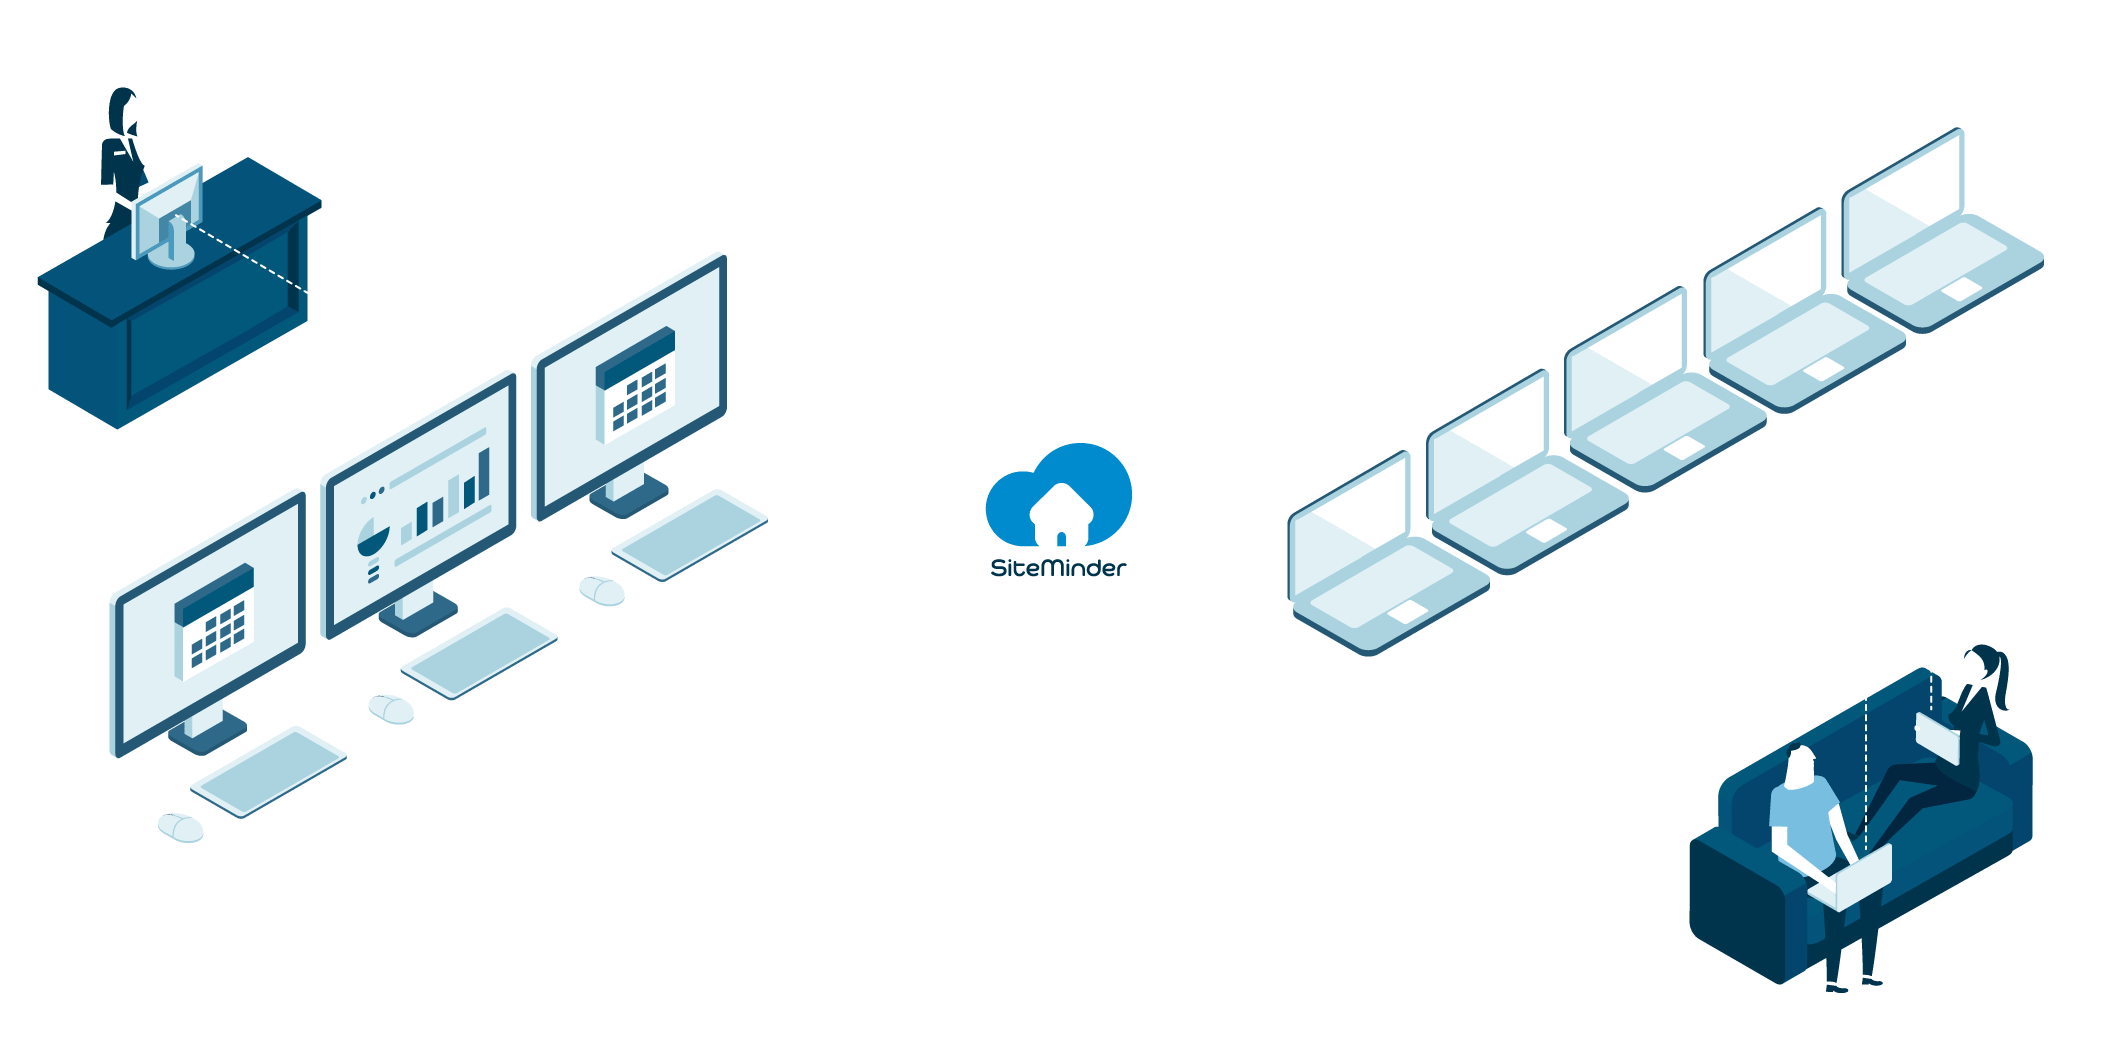 La piattaforma di SiteMinder